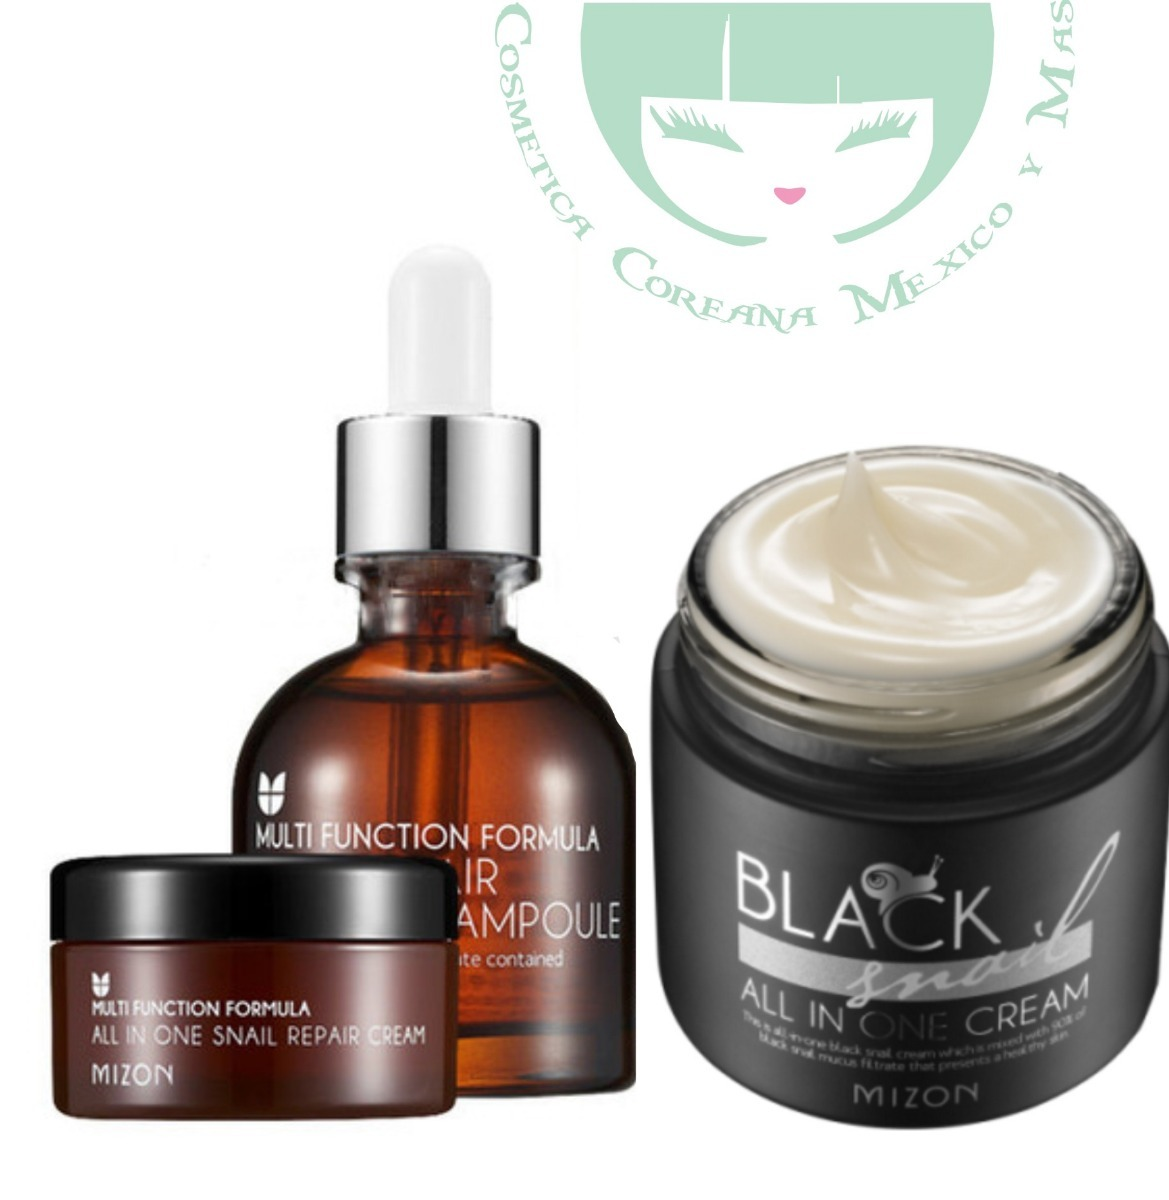 Mizon Serum Snail Intensive Ampoule Crema Black Msi 80000 En Blacksnail All In One Cream 75ml Cargando Zoom